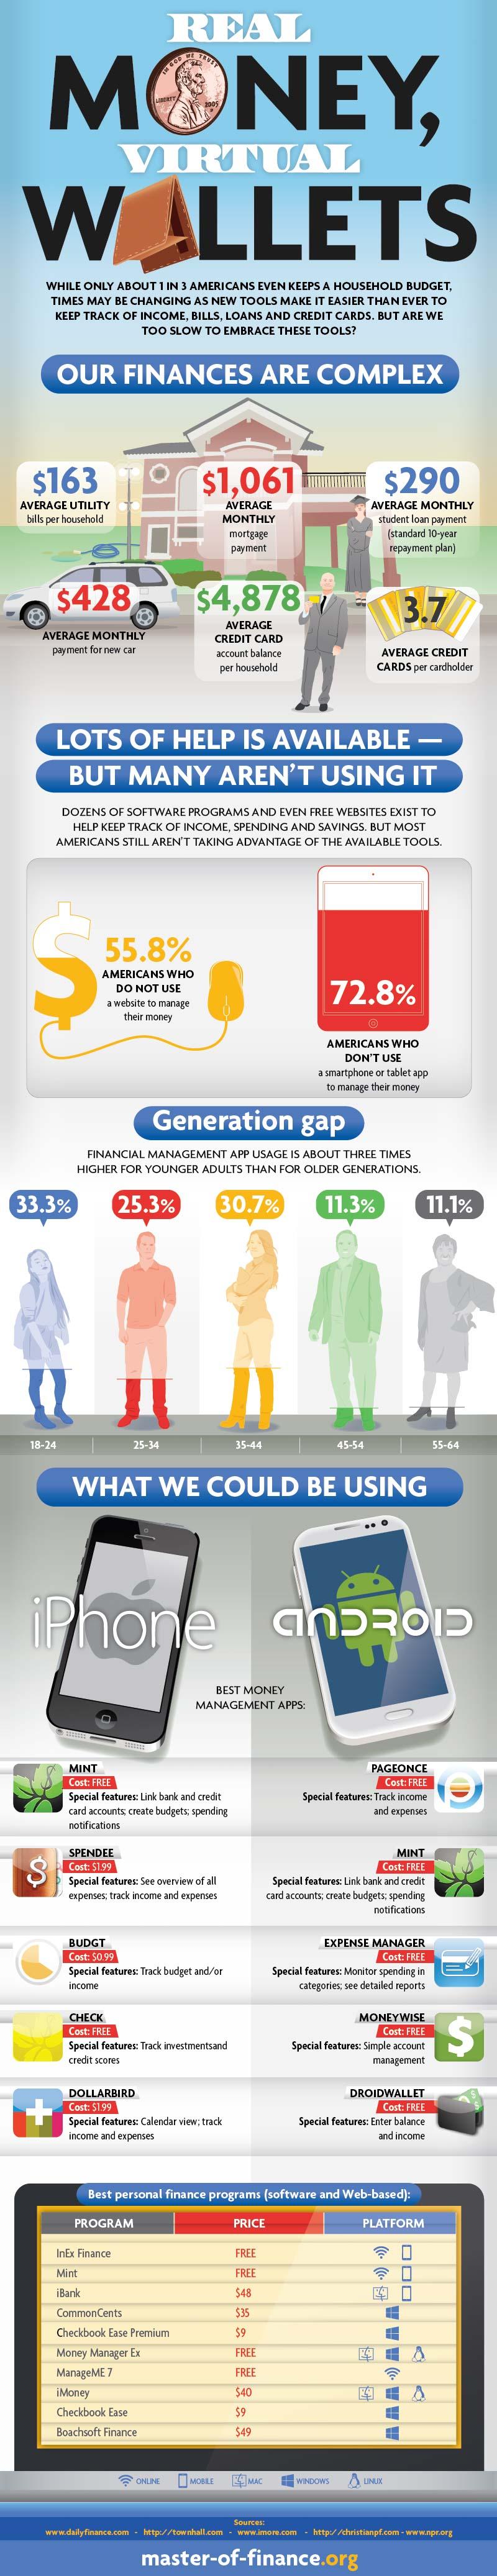 e-Wallet Adoption-Infographic